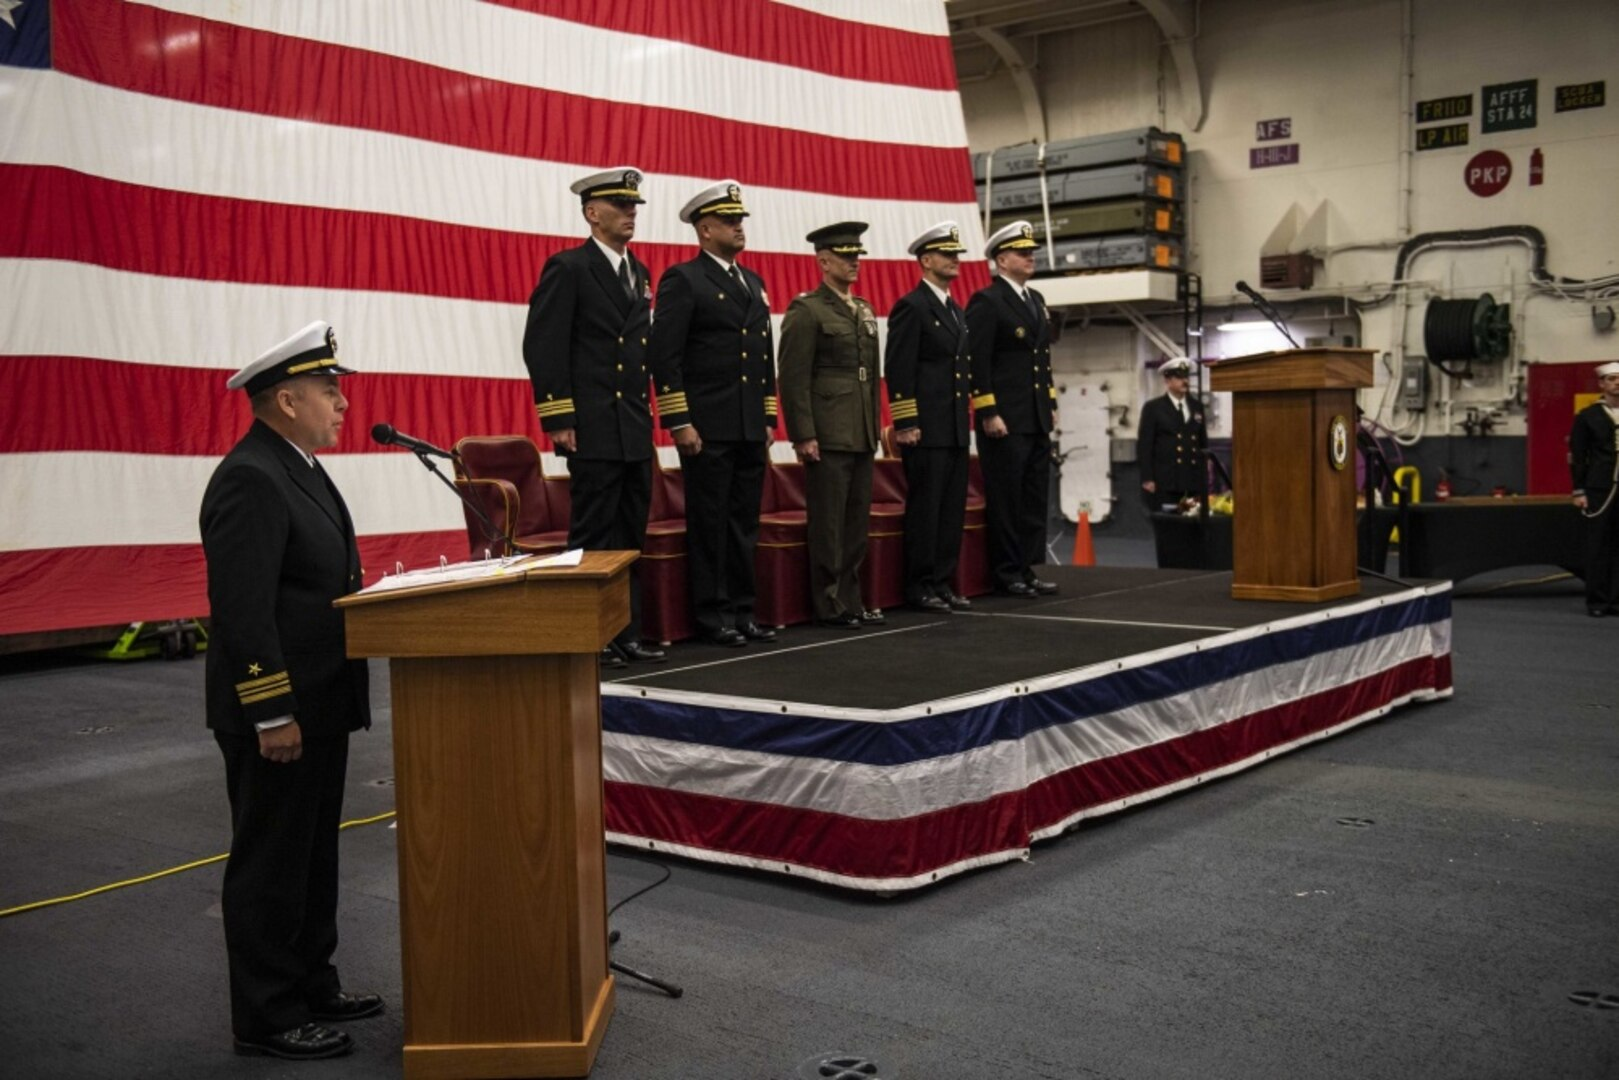 Lebron takes over as Amphibious Squadron 11 Commodore